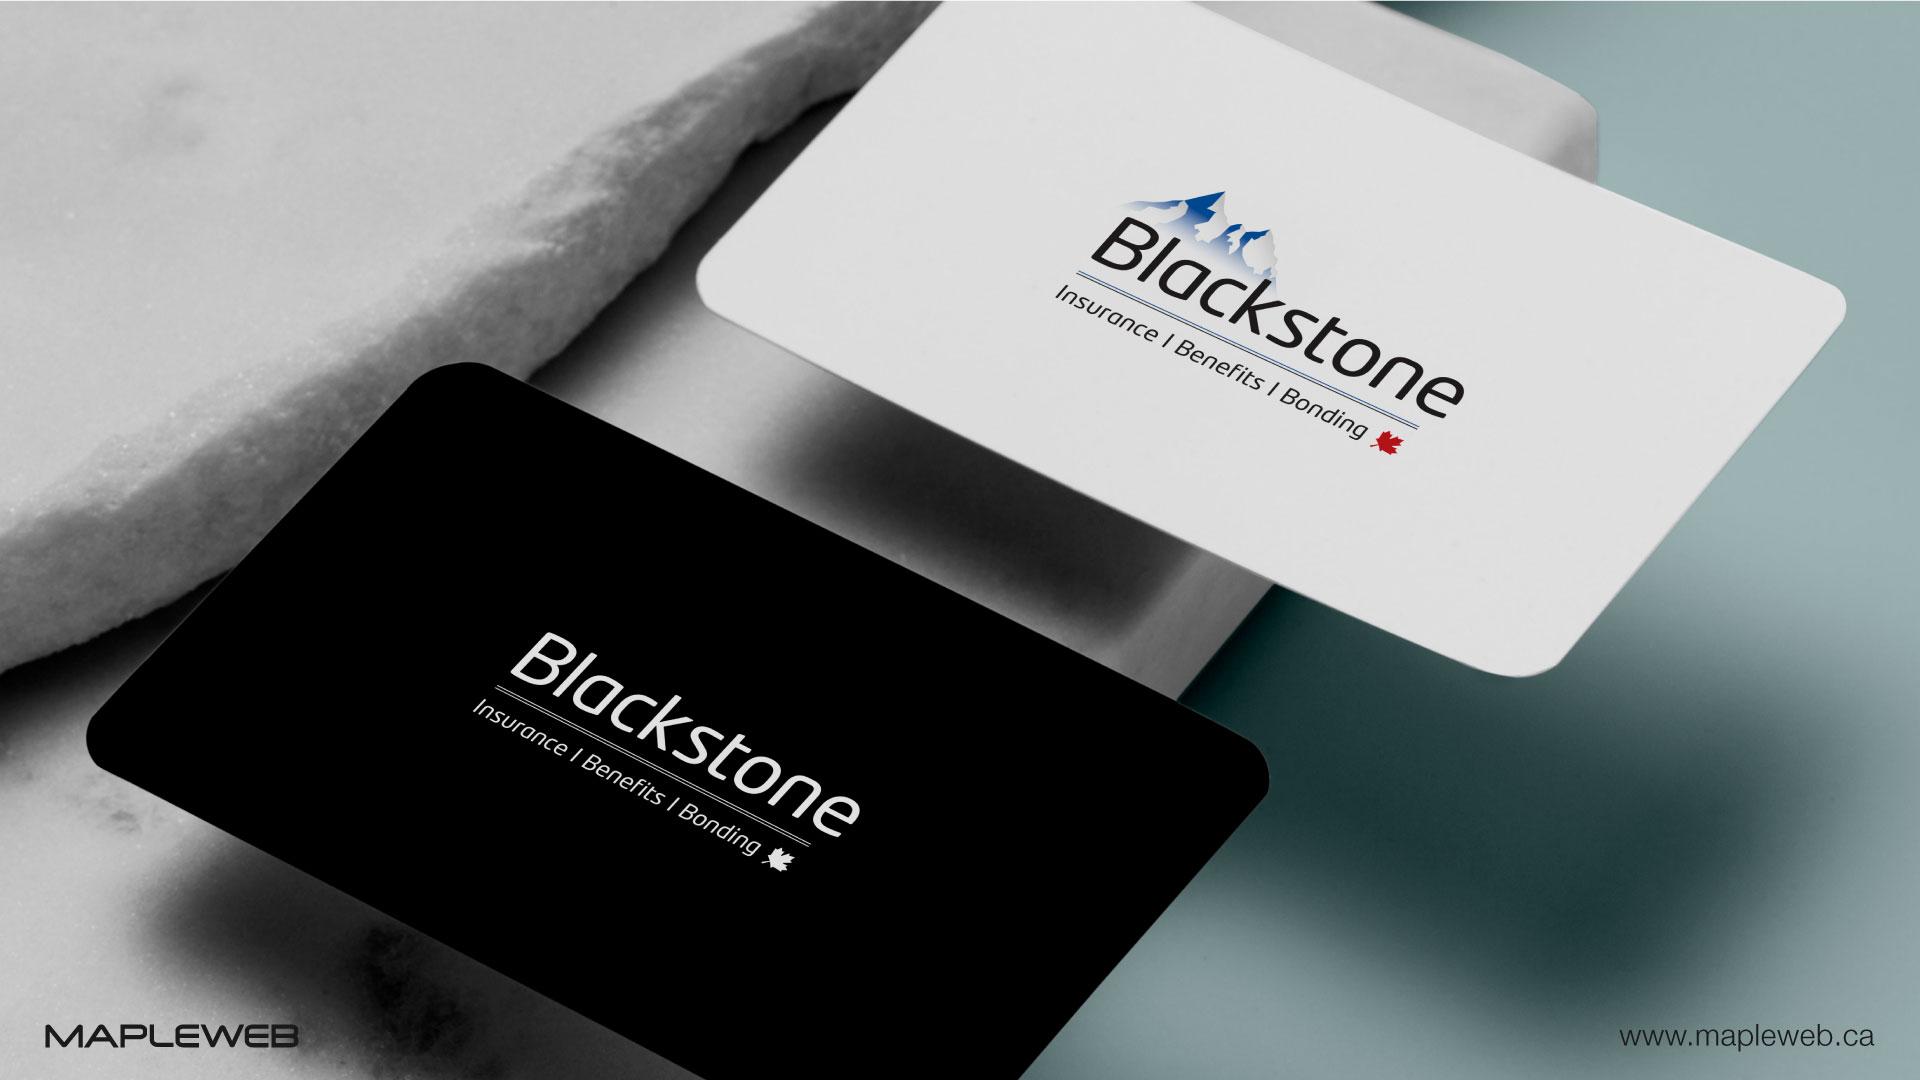 blackstone-brand-logo-design-by-mapleweb-vancouver-canada-business-card-mock